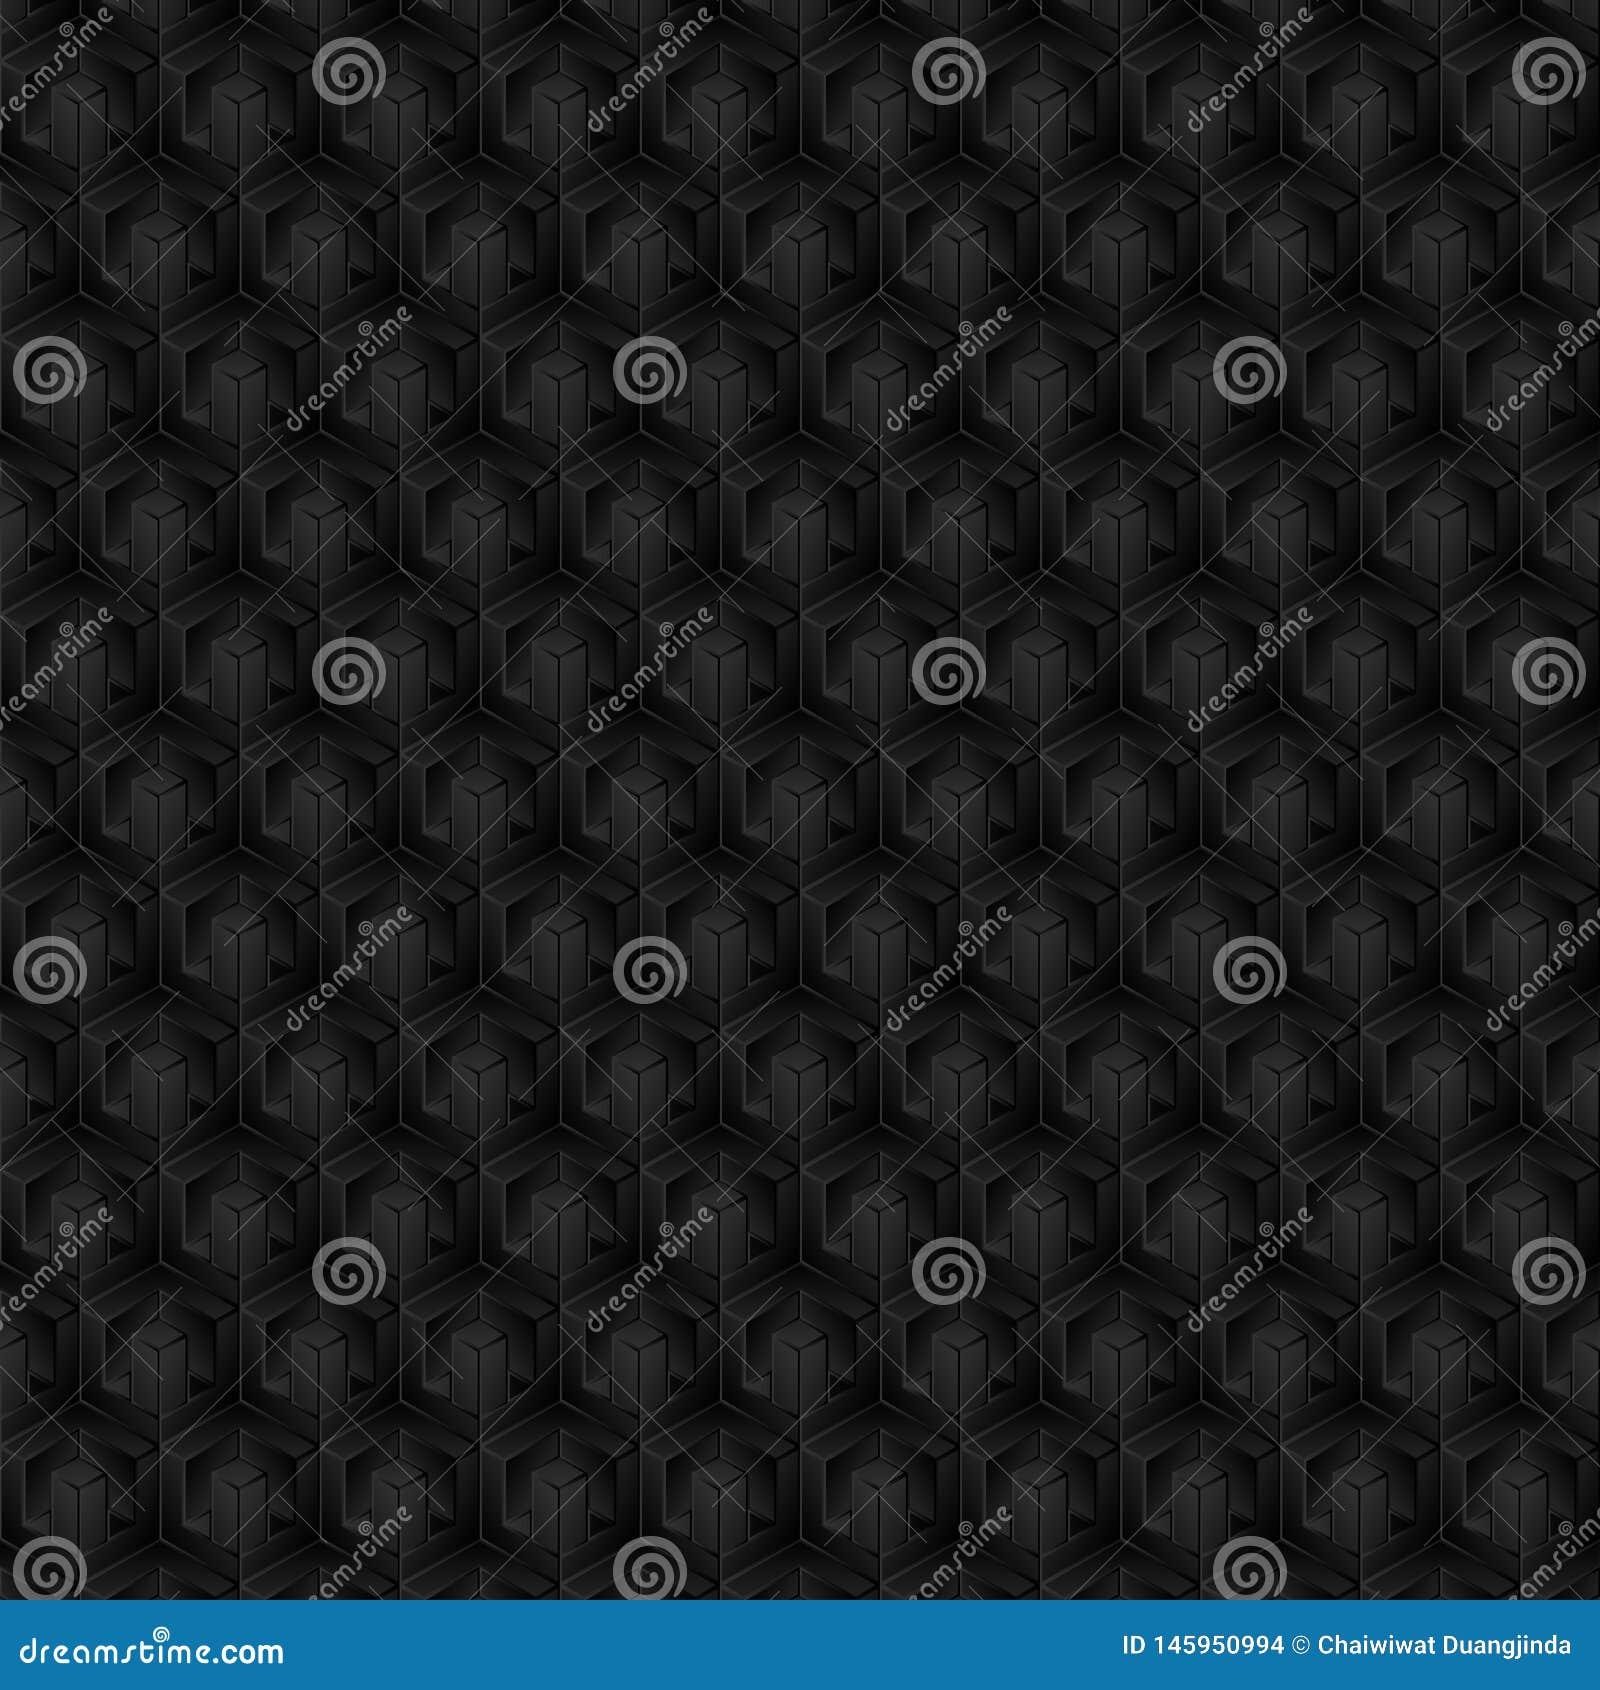 3D形状,样式,阴影颜色,黑,灰色作为背景,抽象